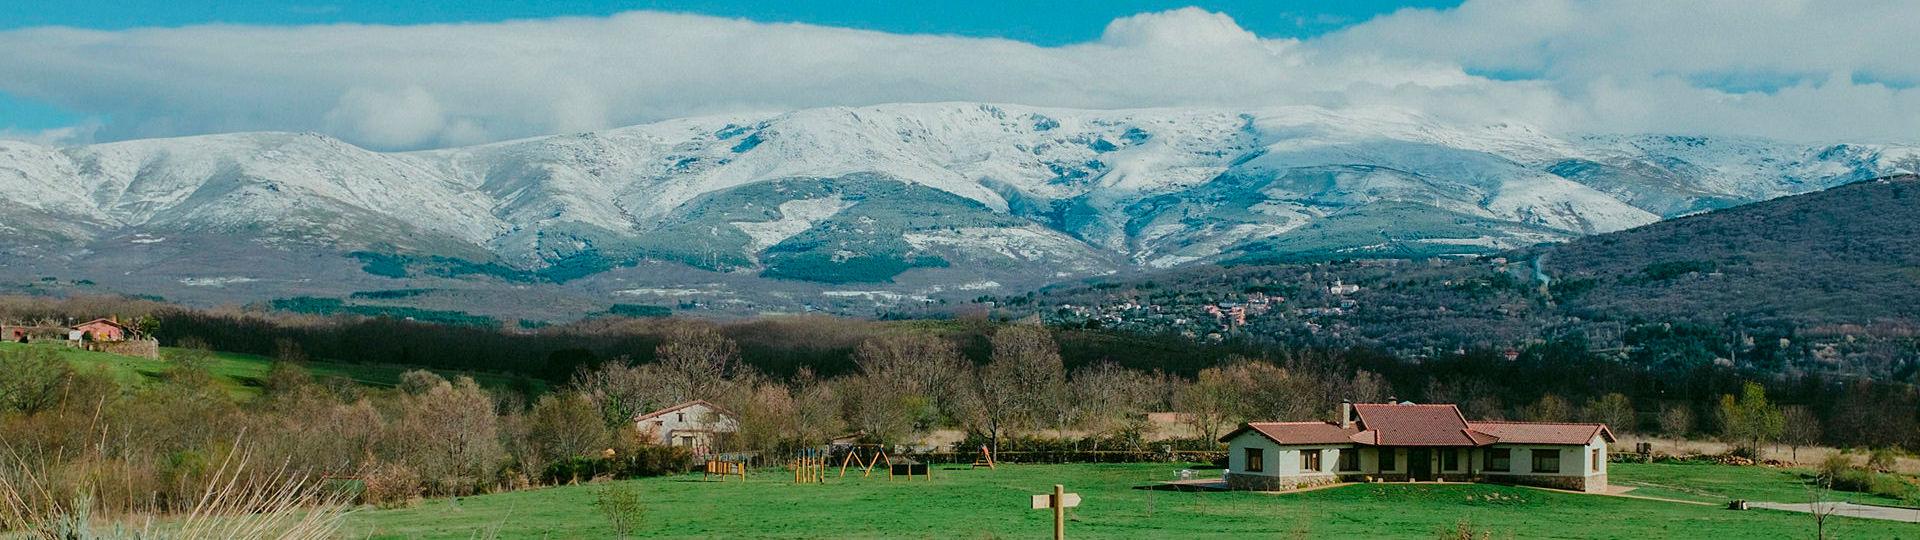 Turismo: Posada-Altair